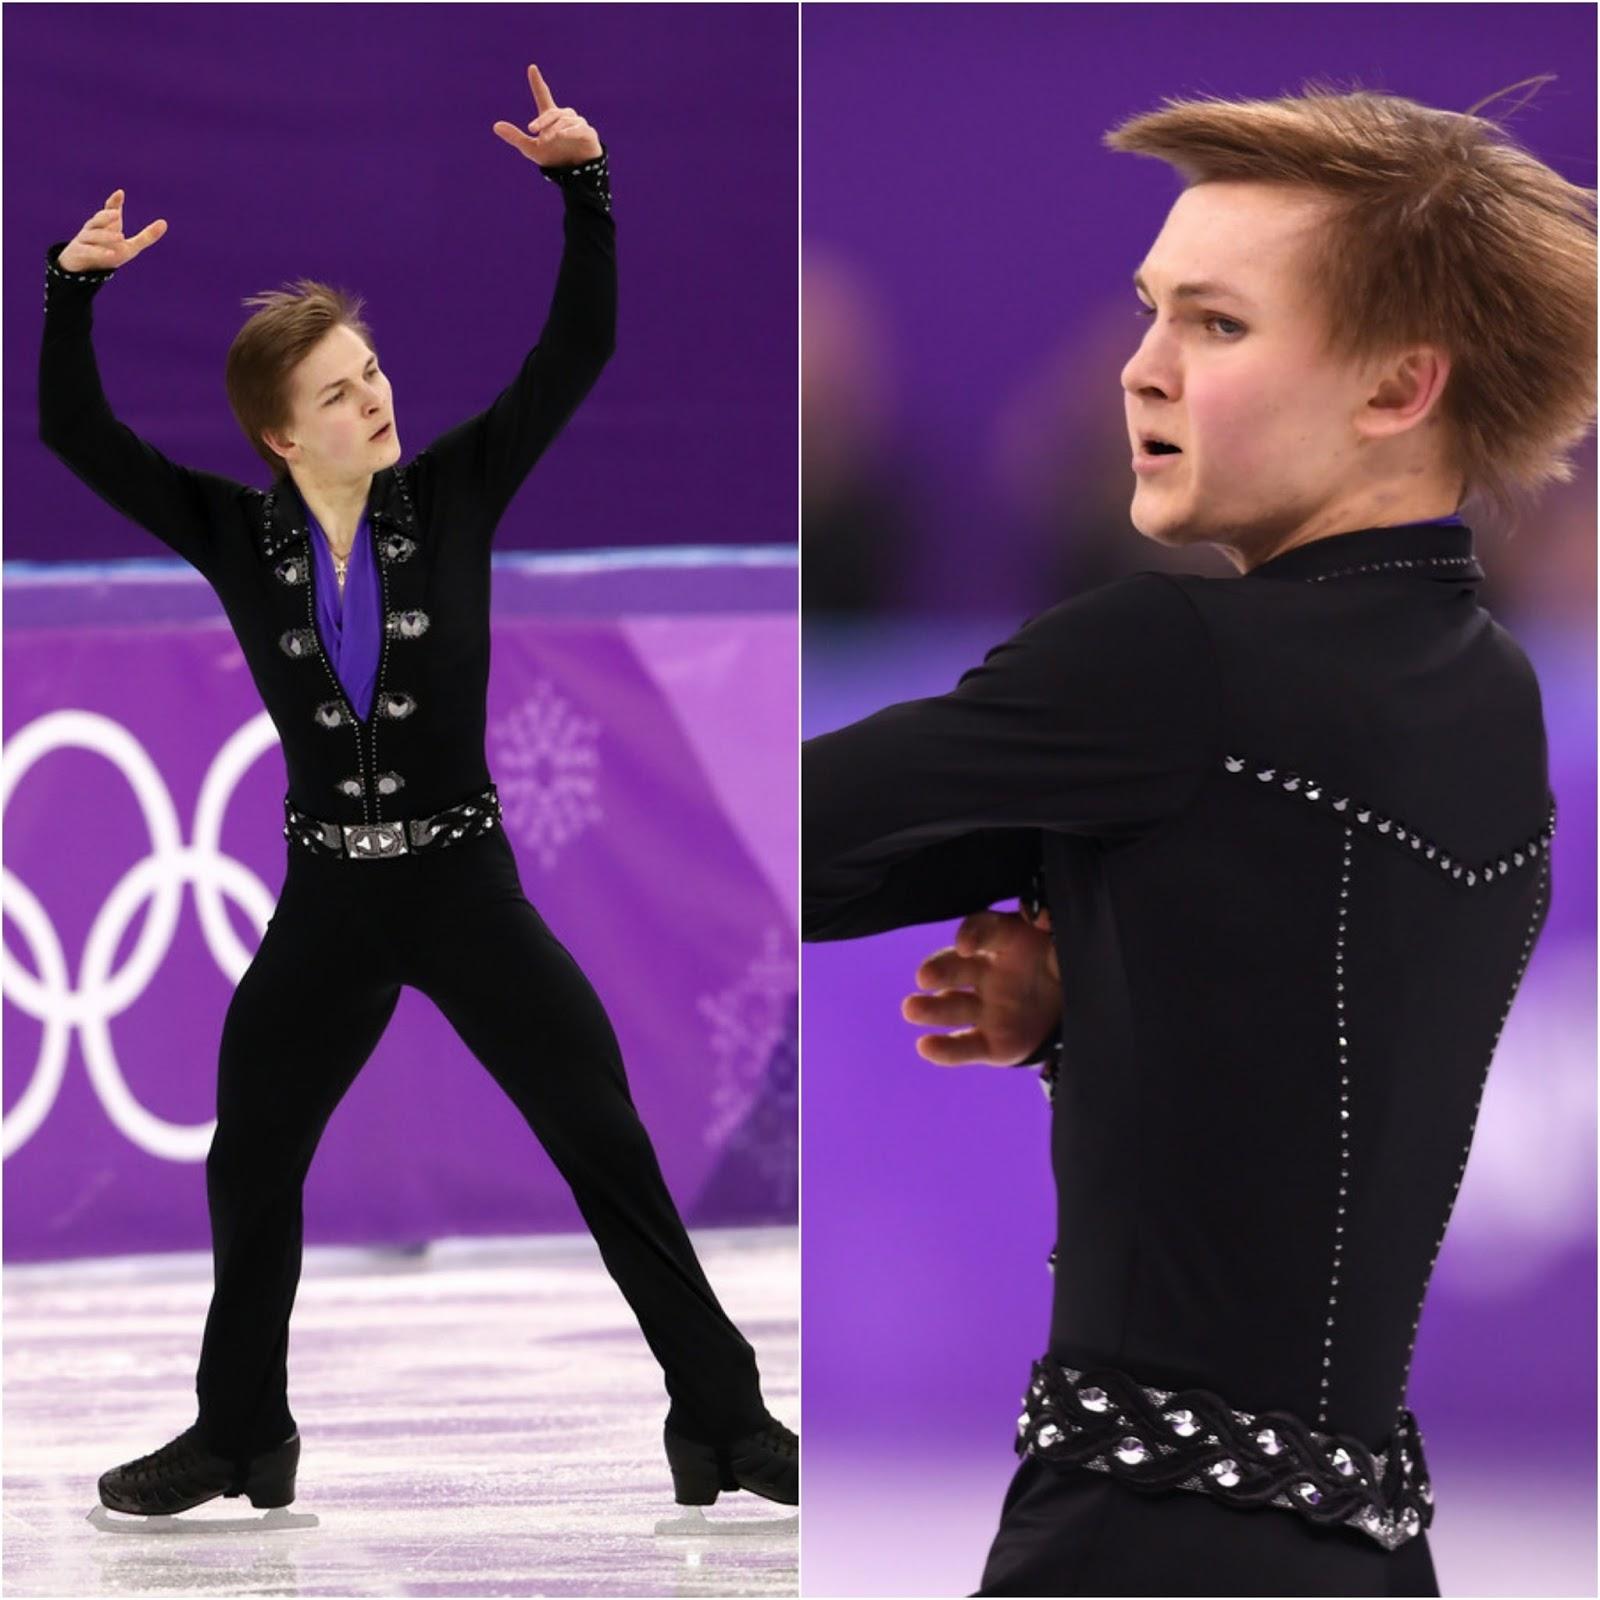 Nick Verreos Ice Style 2018 Winter Olympics Figure Skating Costumes Recap Men S Costumes